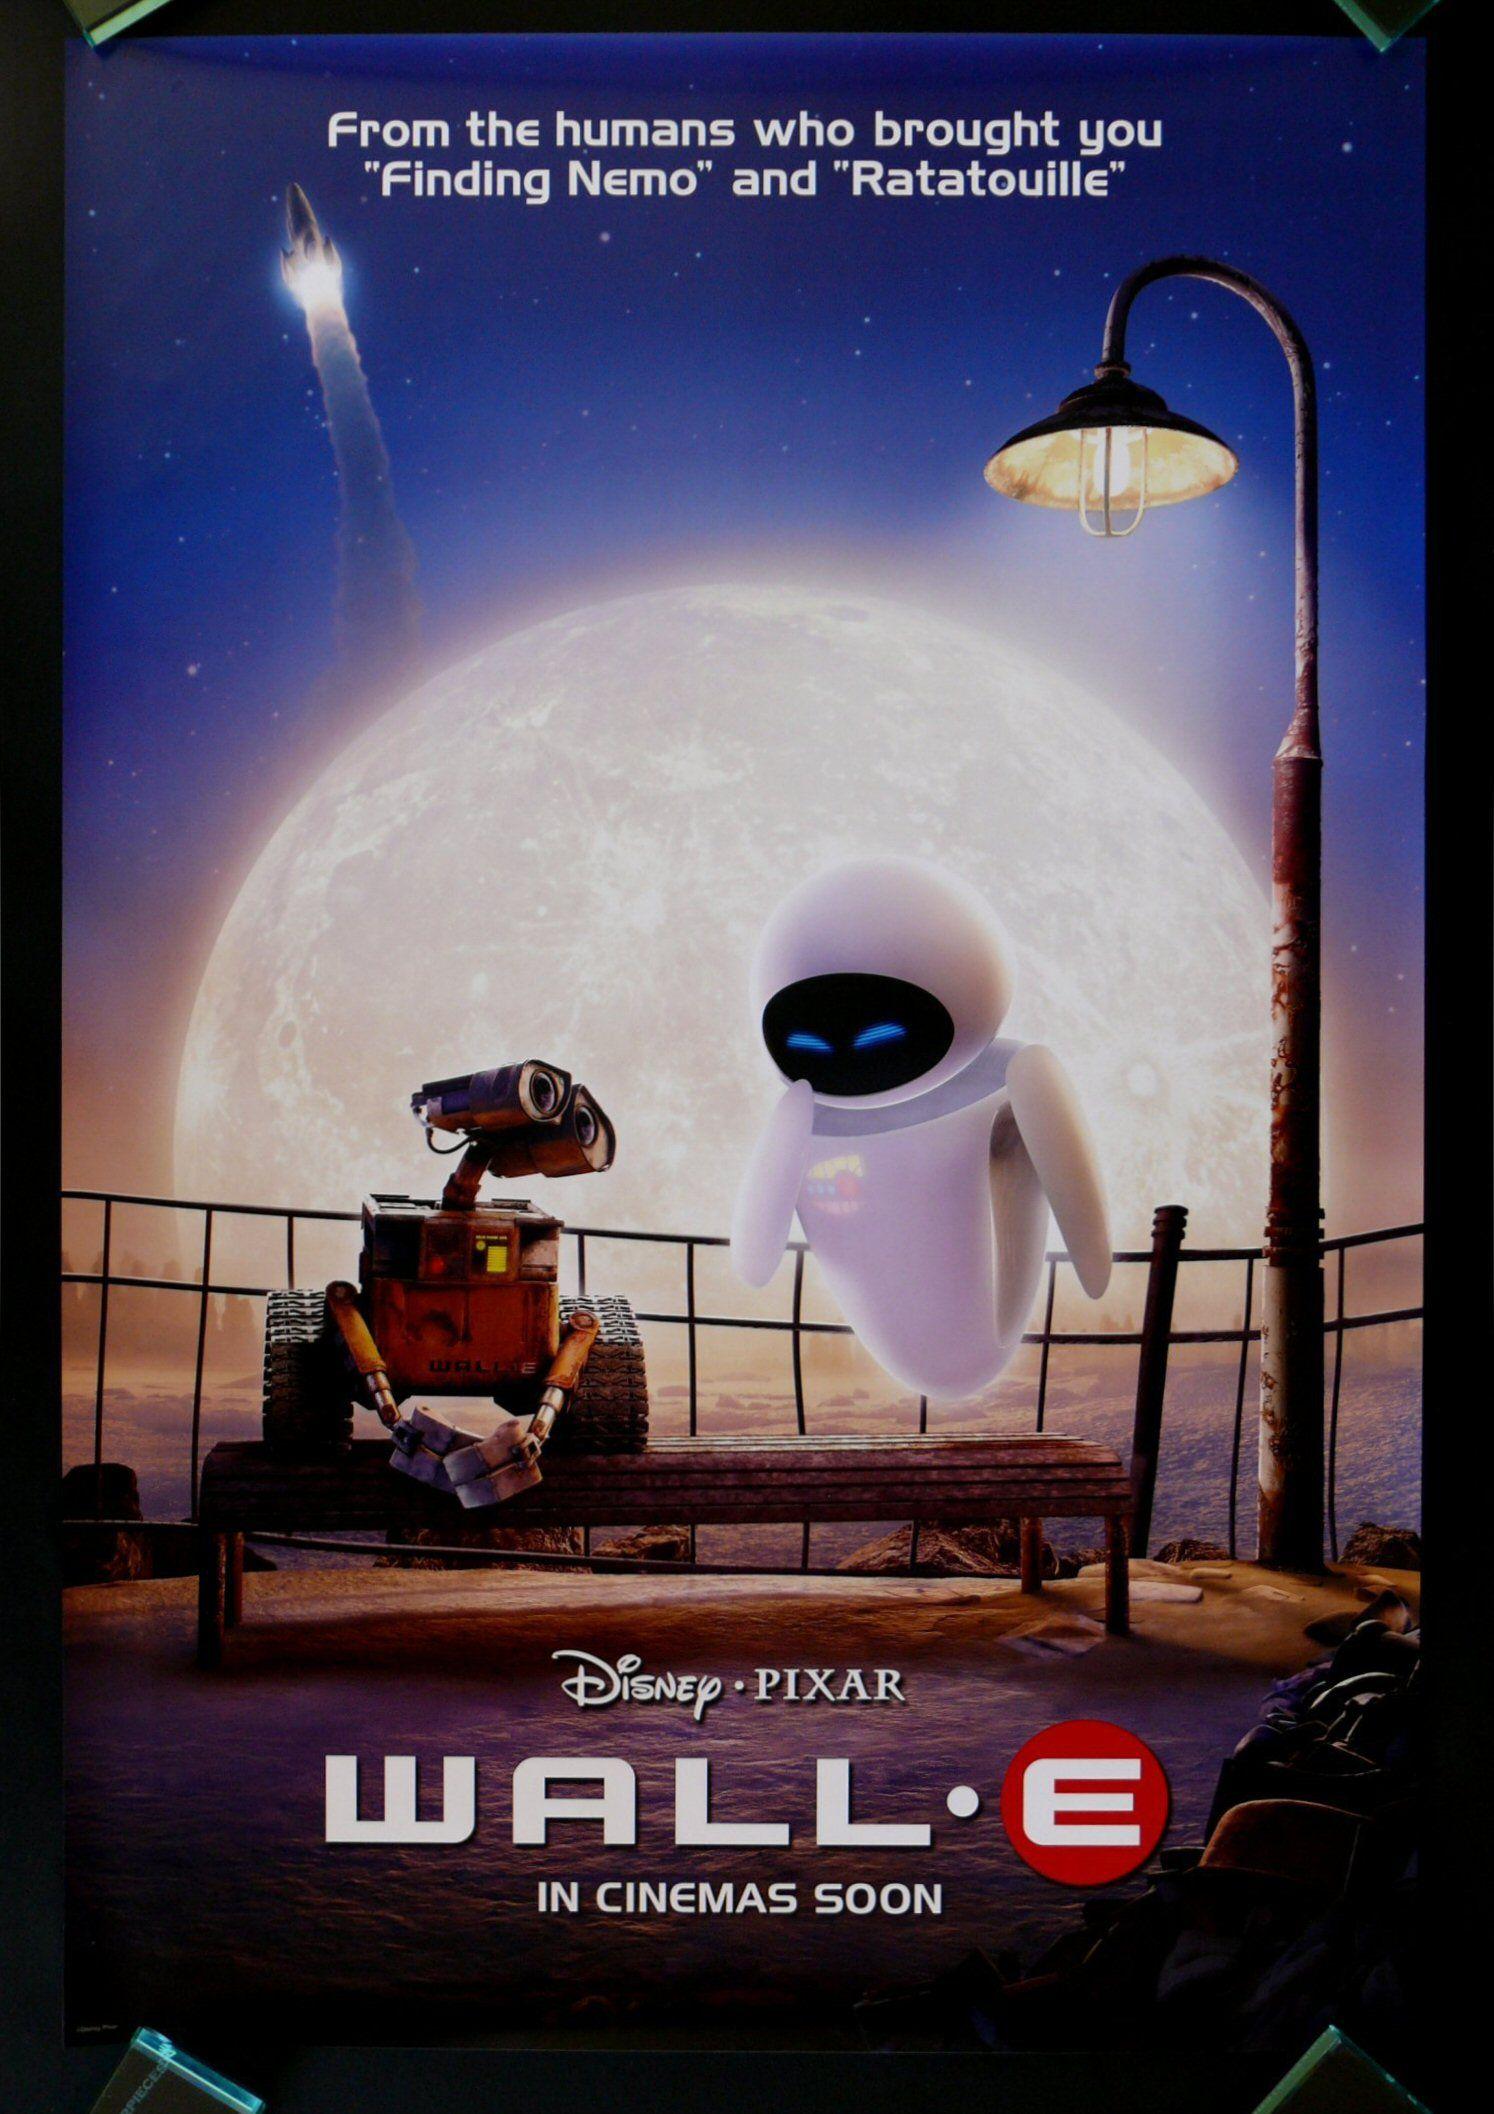 Details about WALLE Original Movie Poster (BLUE VER